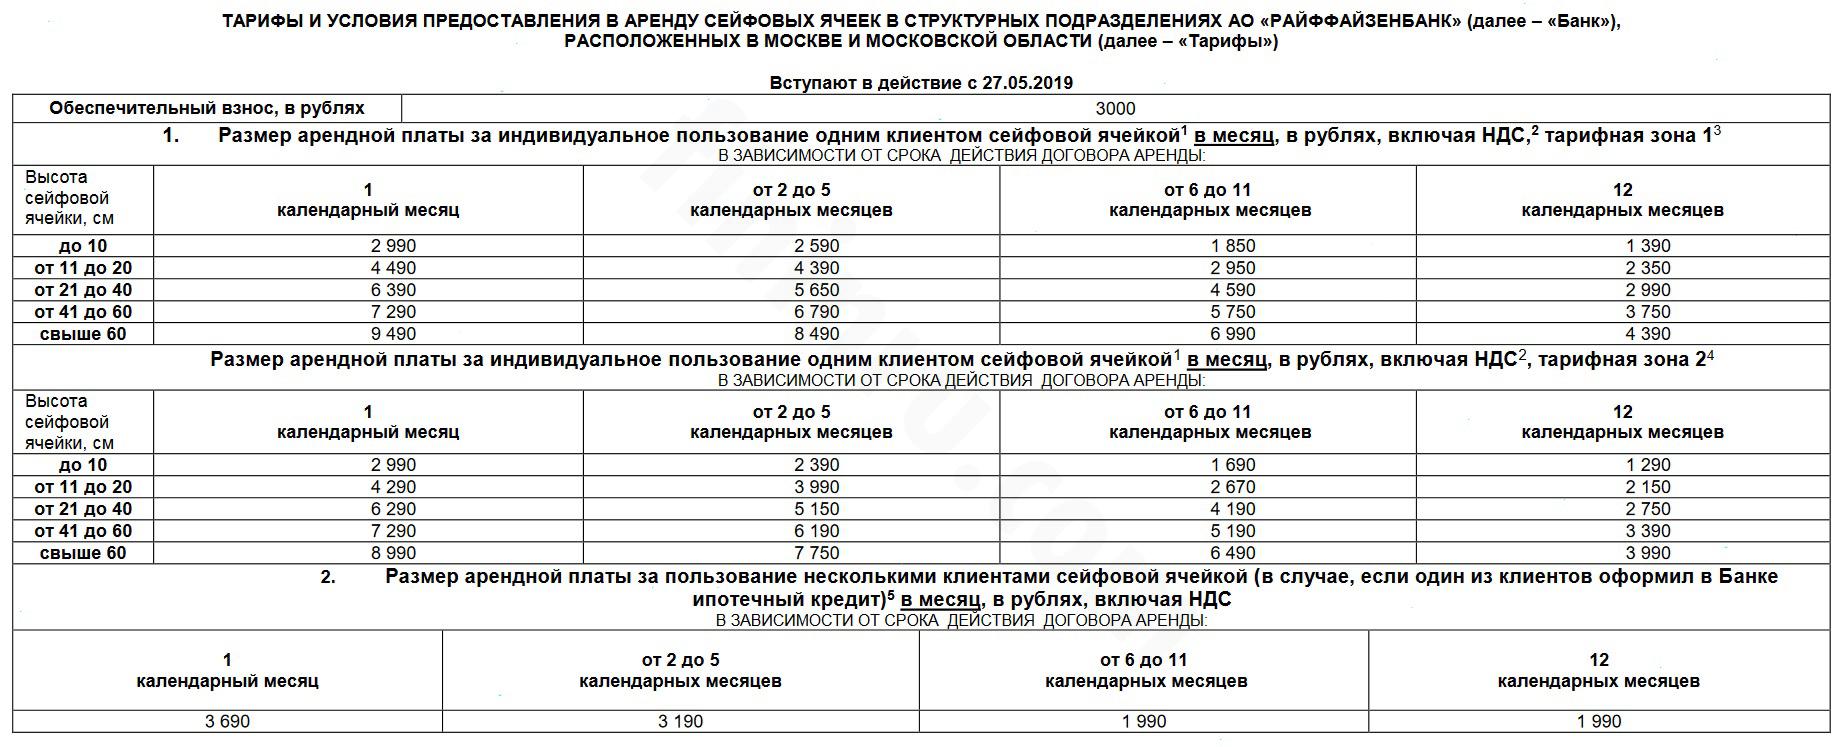 Аренда ячейки РФБ в Москве